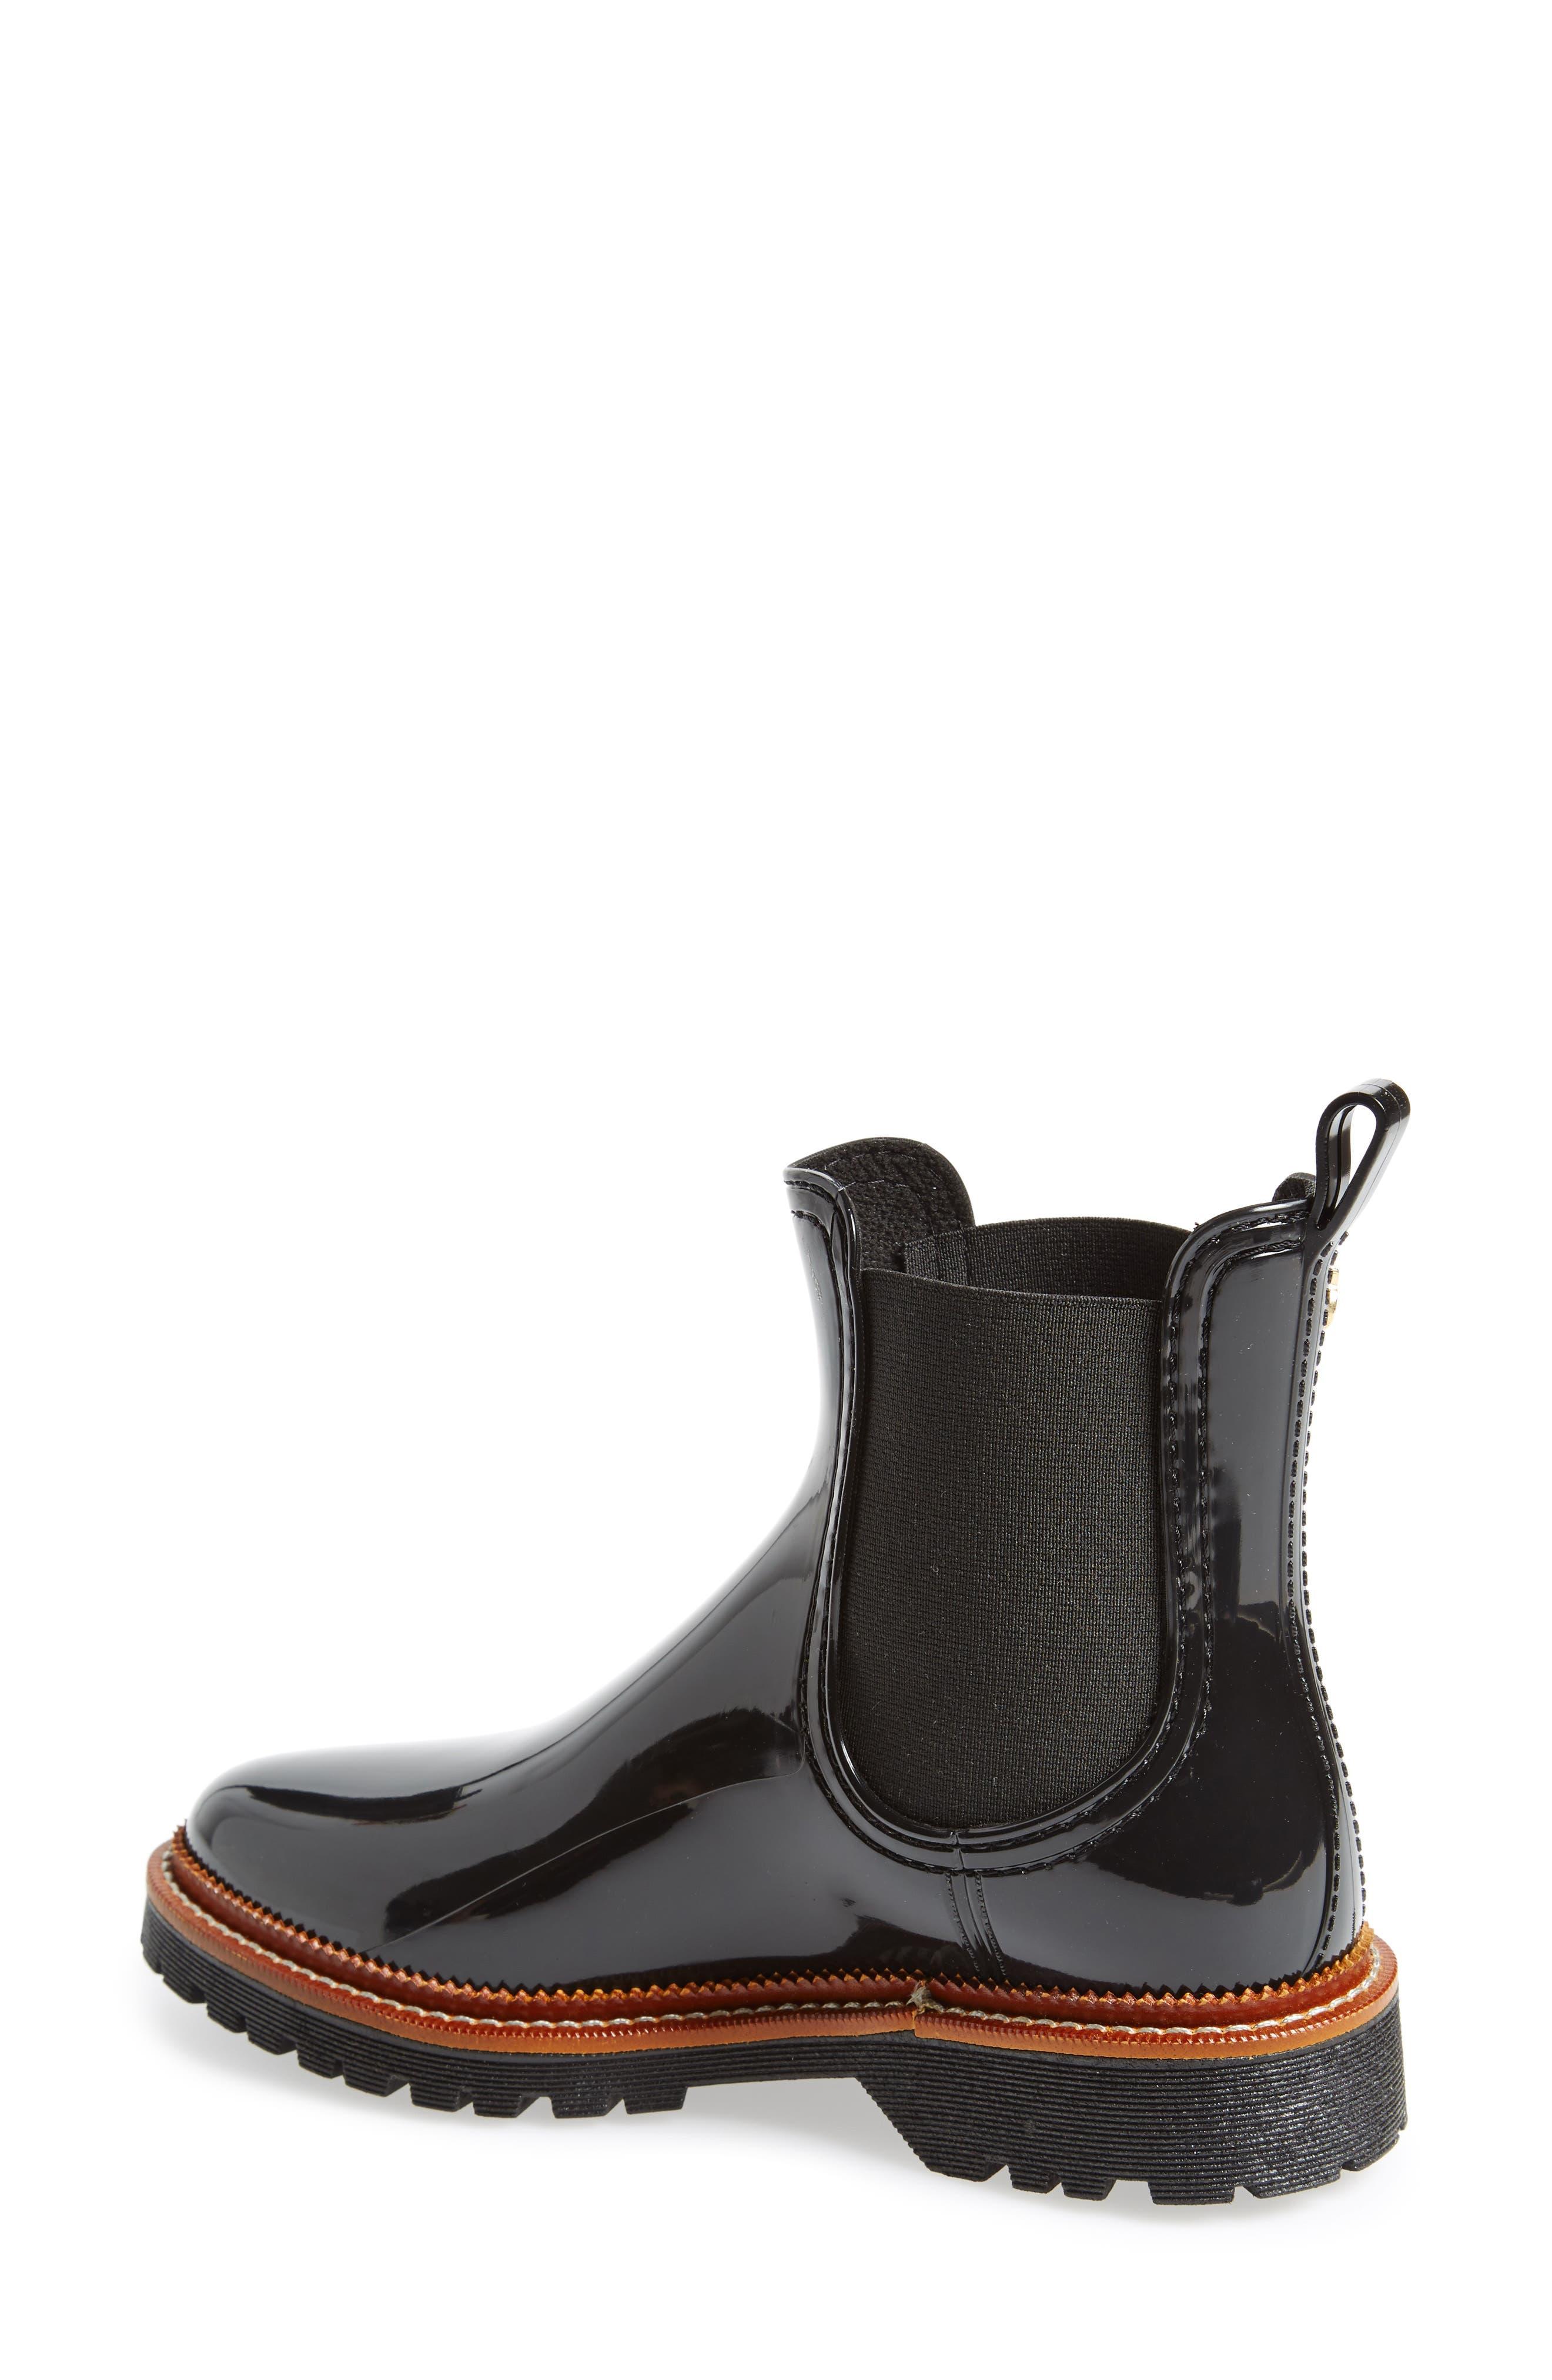 April Waterproof Chelsea Boot,                             Alternate thumbnail 2, color,                             001